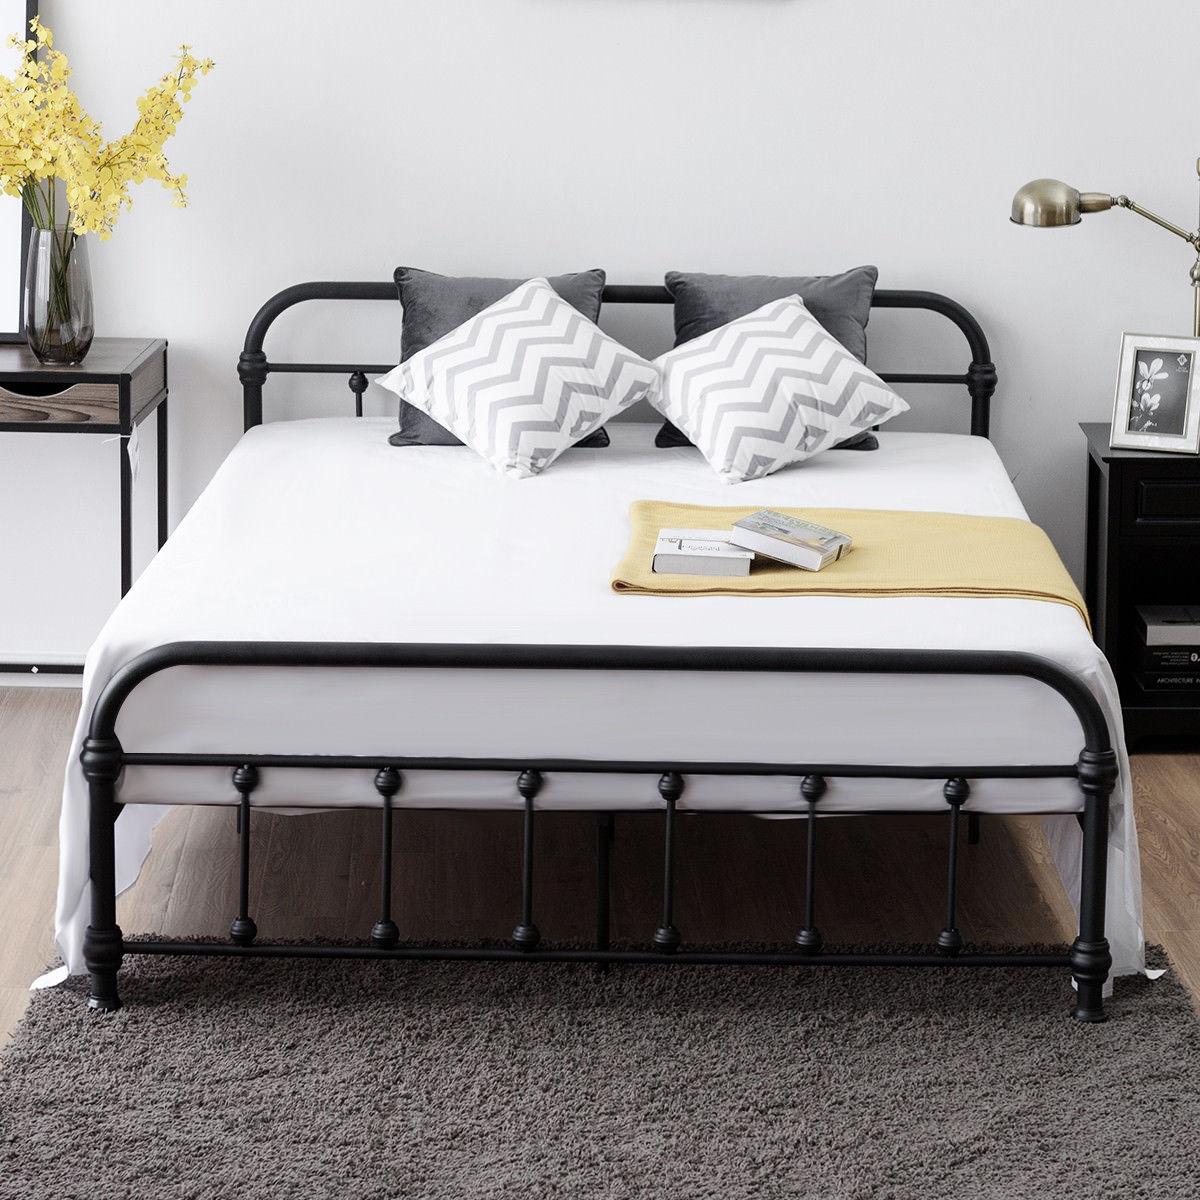 Queen Size Metal Steel Bed Frame w/ Stable Metal Slats